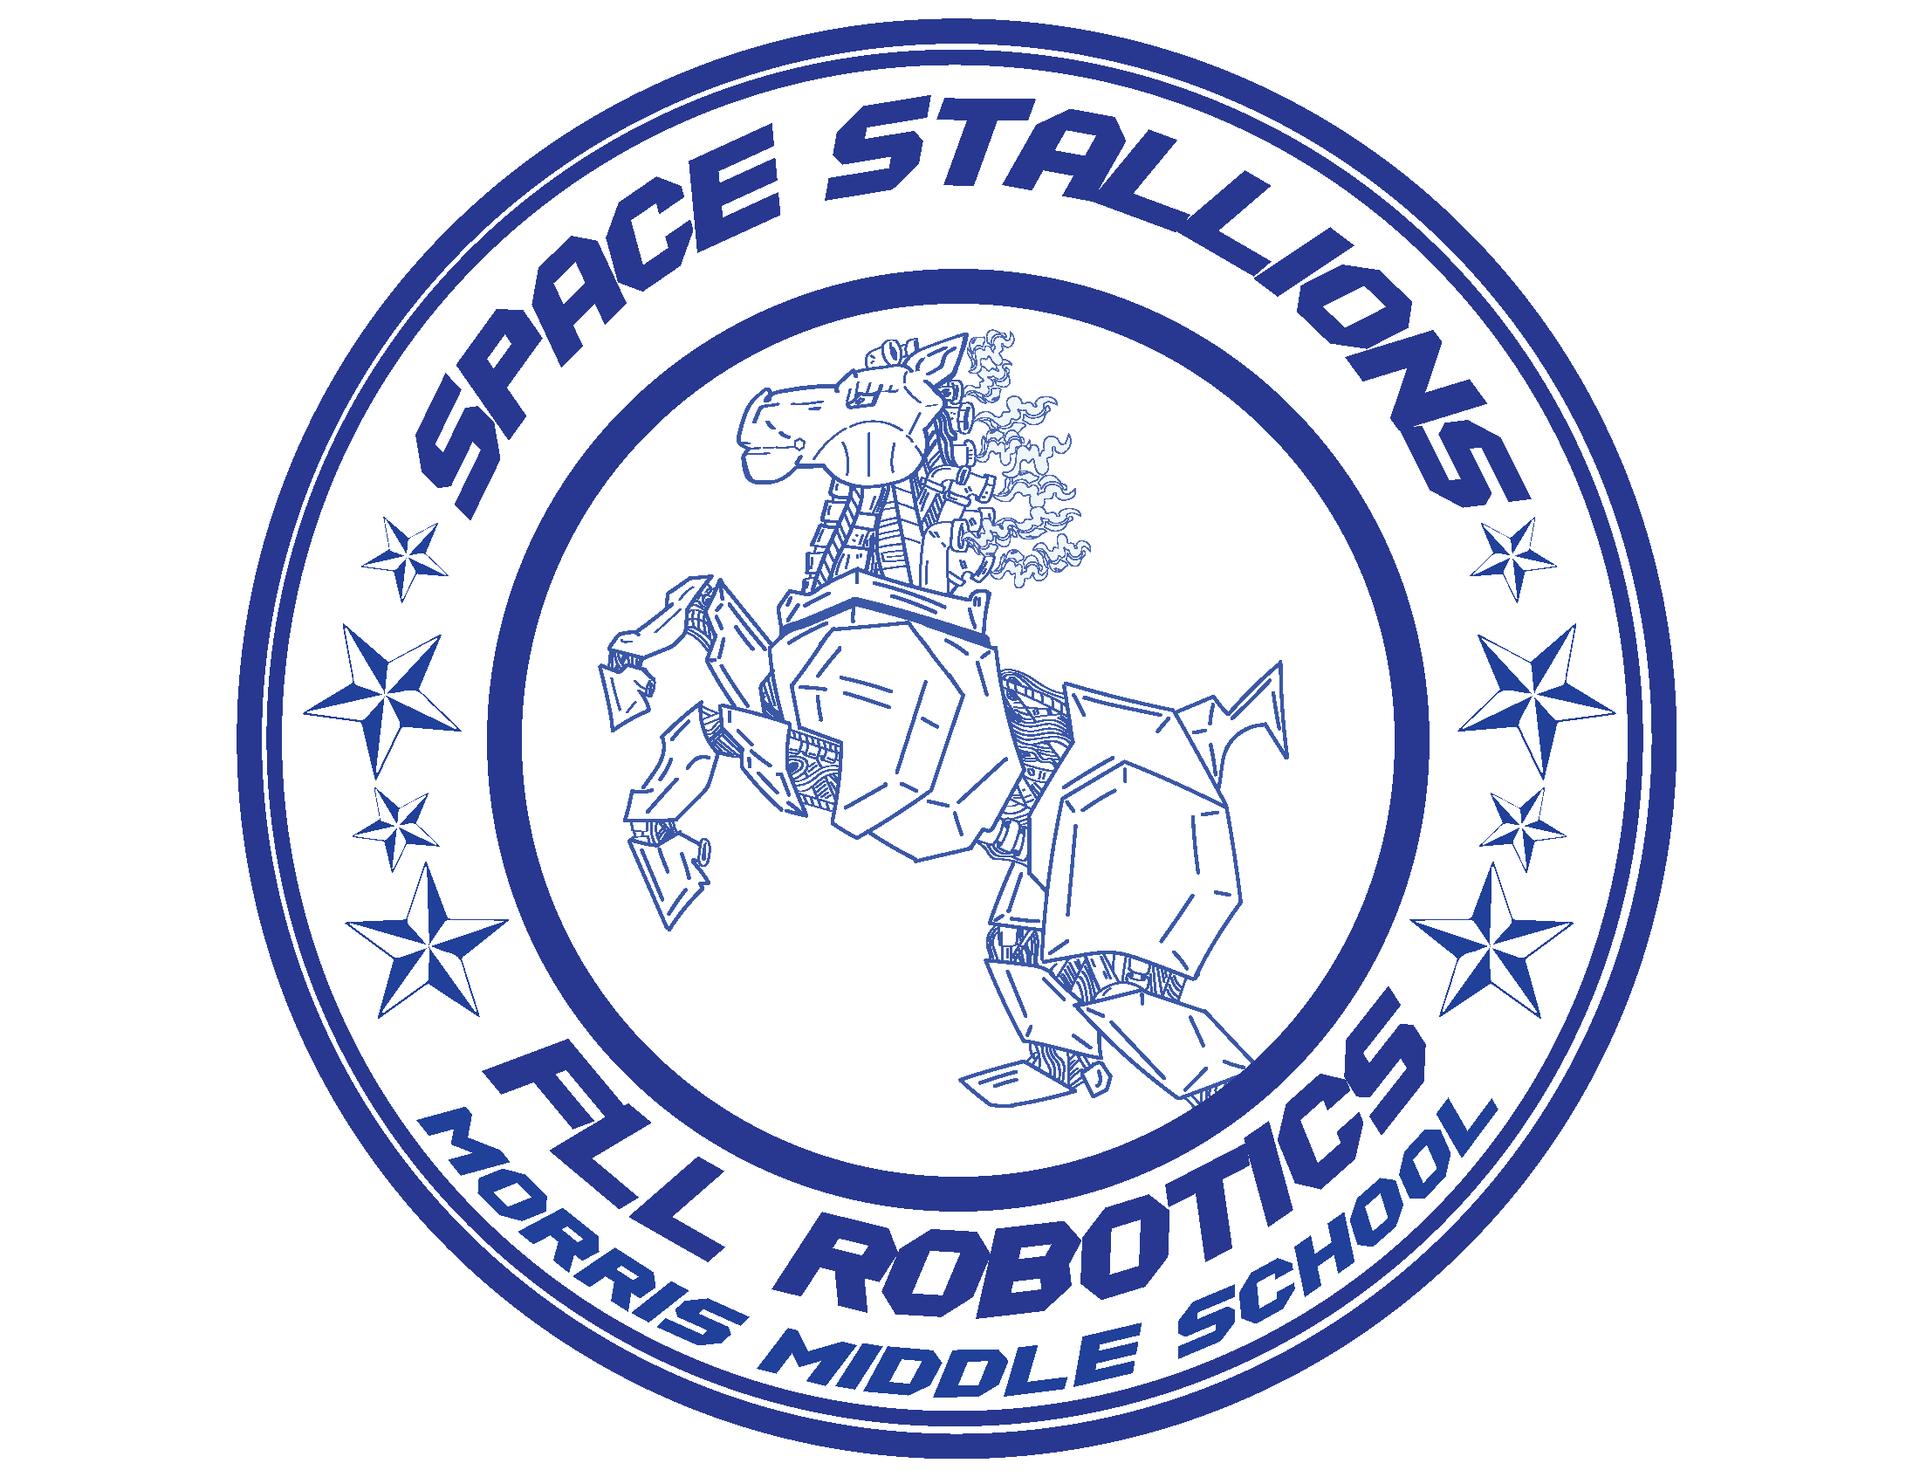 space stallions logo